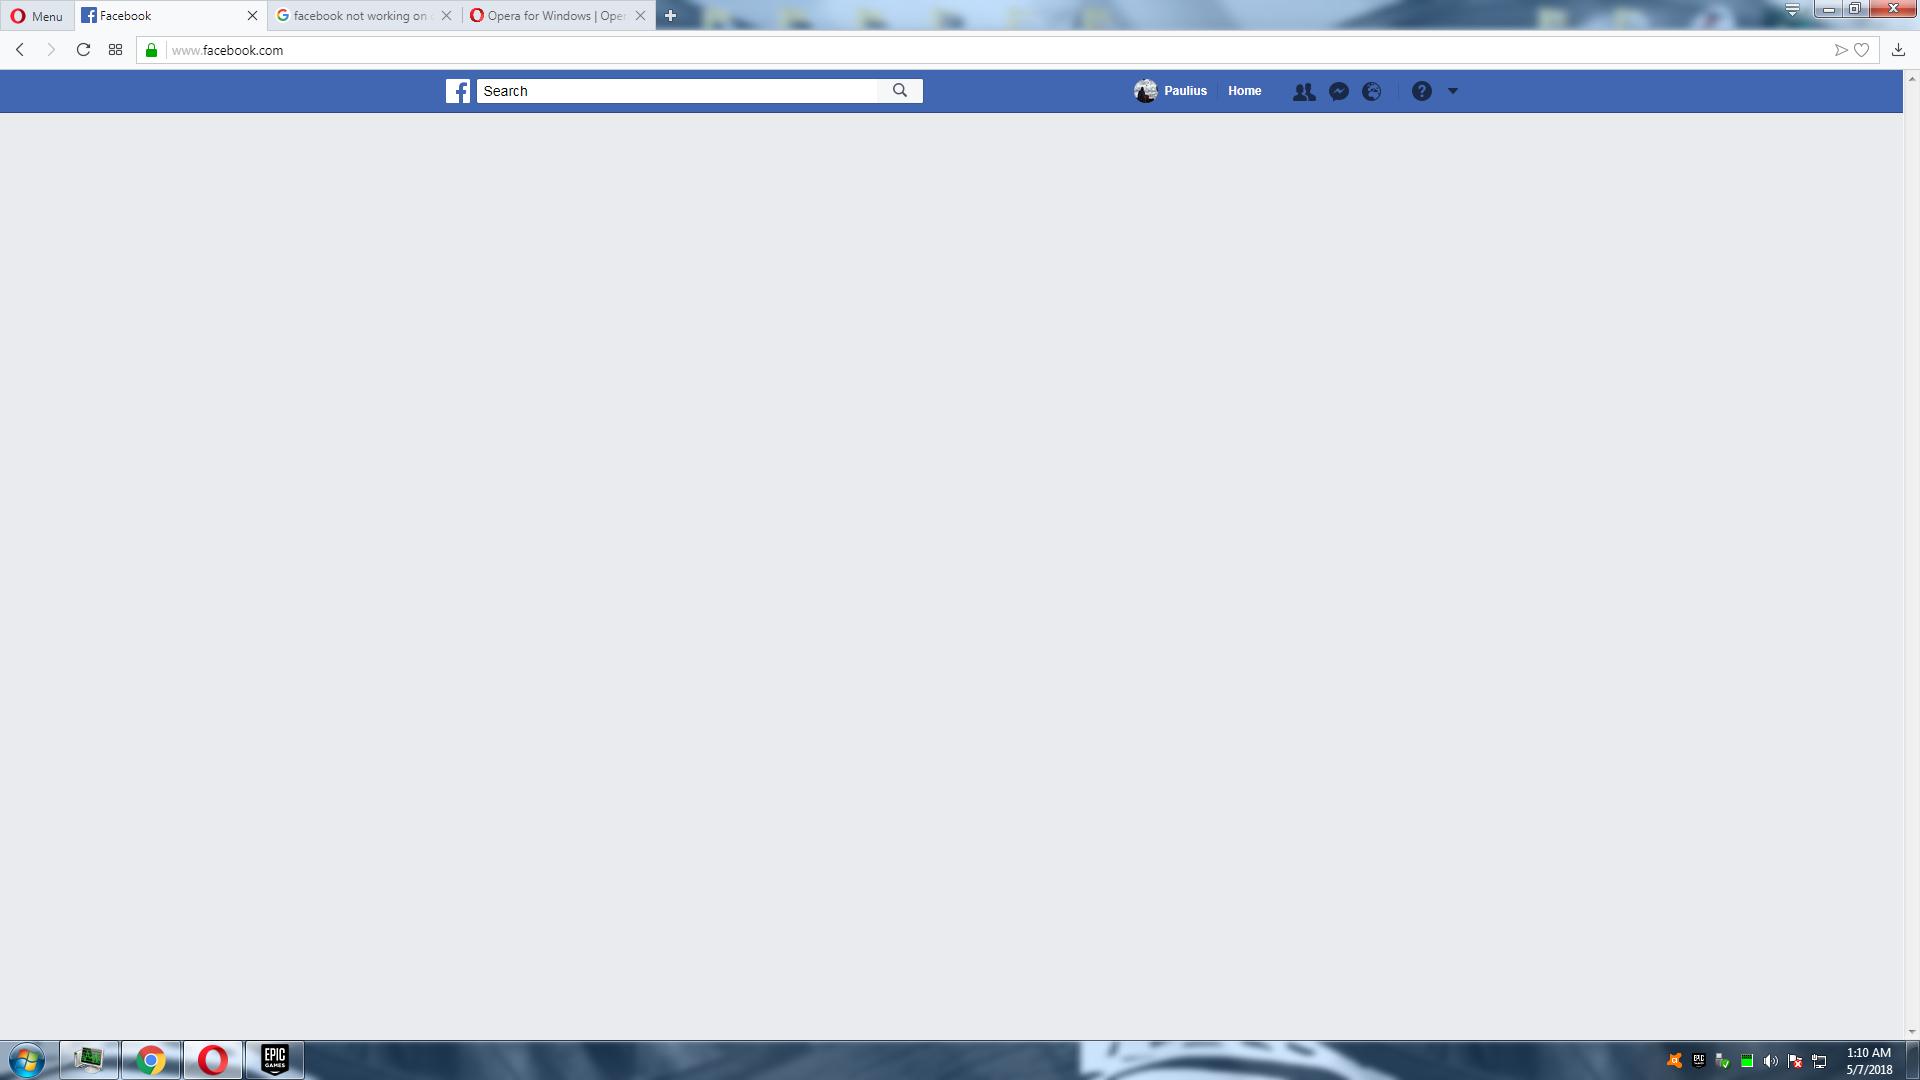 facebook not loading on opera? | Opera forums